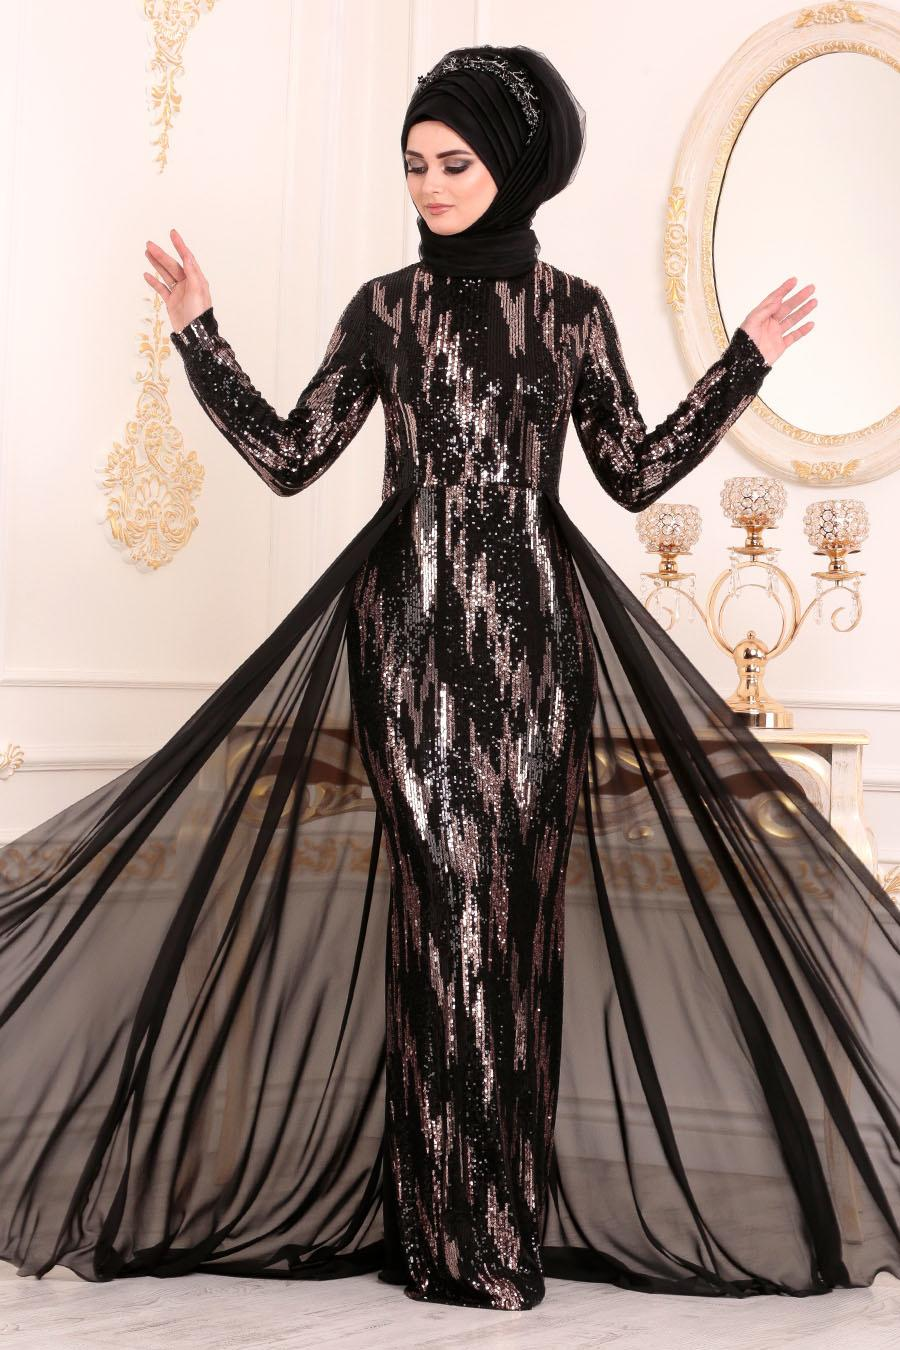 Nayla Collection - Pul Payetli Siyah Tesettür Abiye Elbise 25740S